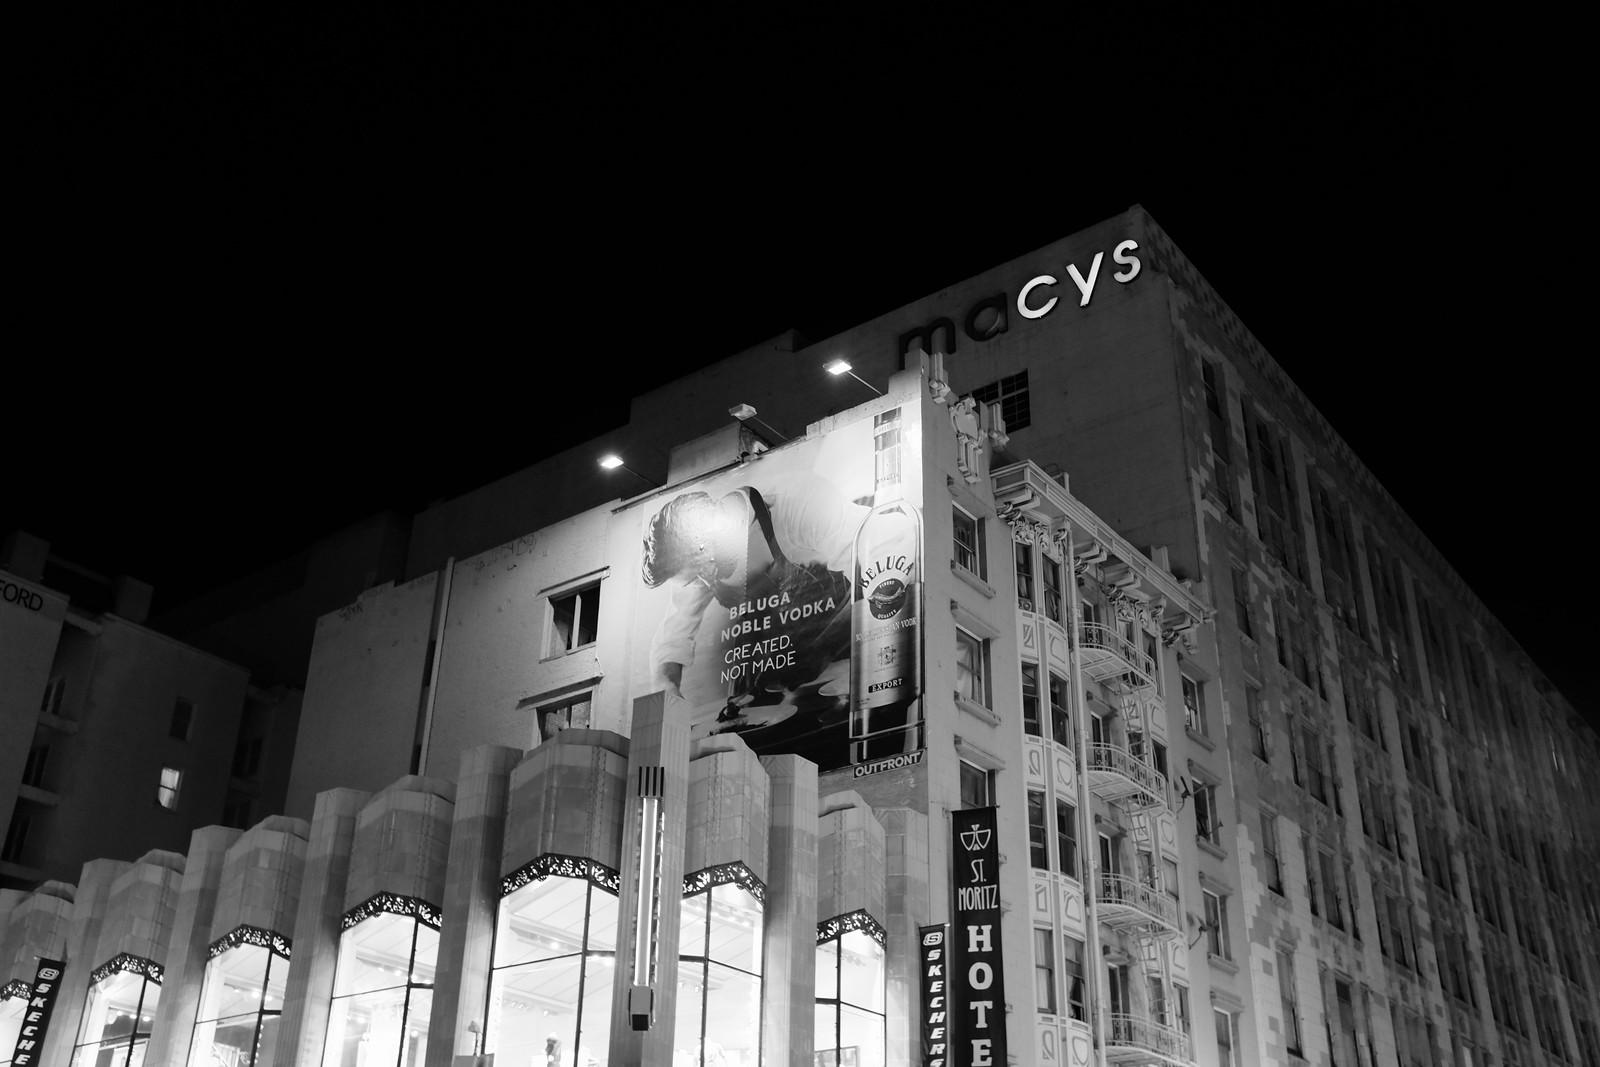 The Sanfrancisco night photo by FUJIFILM X100S.